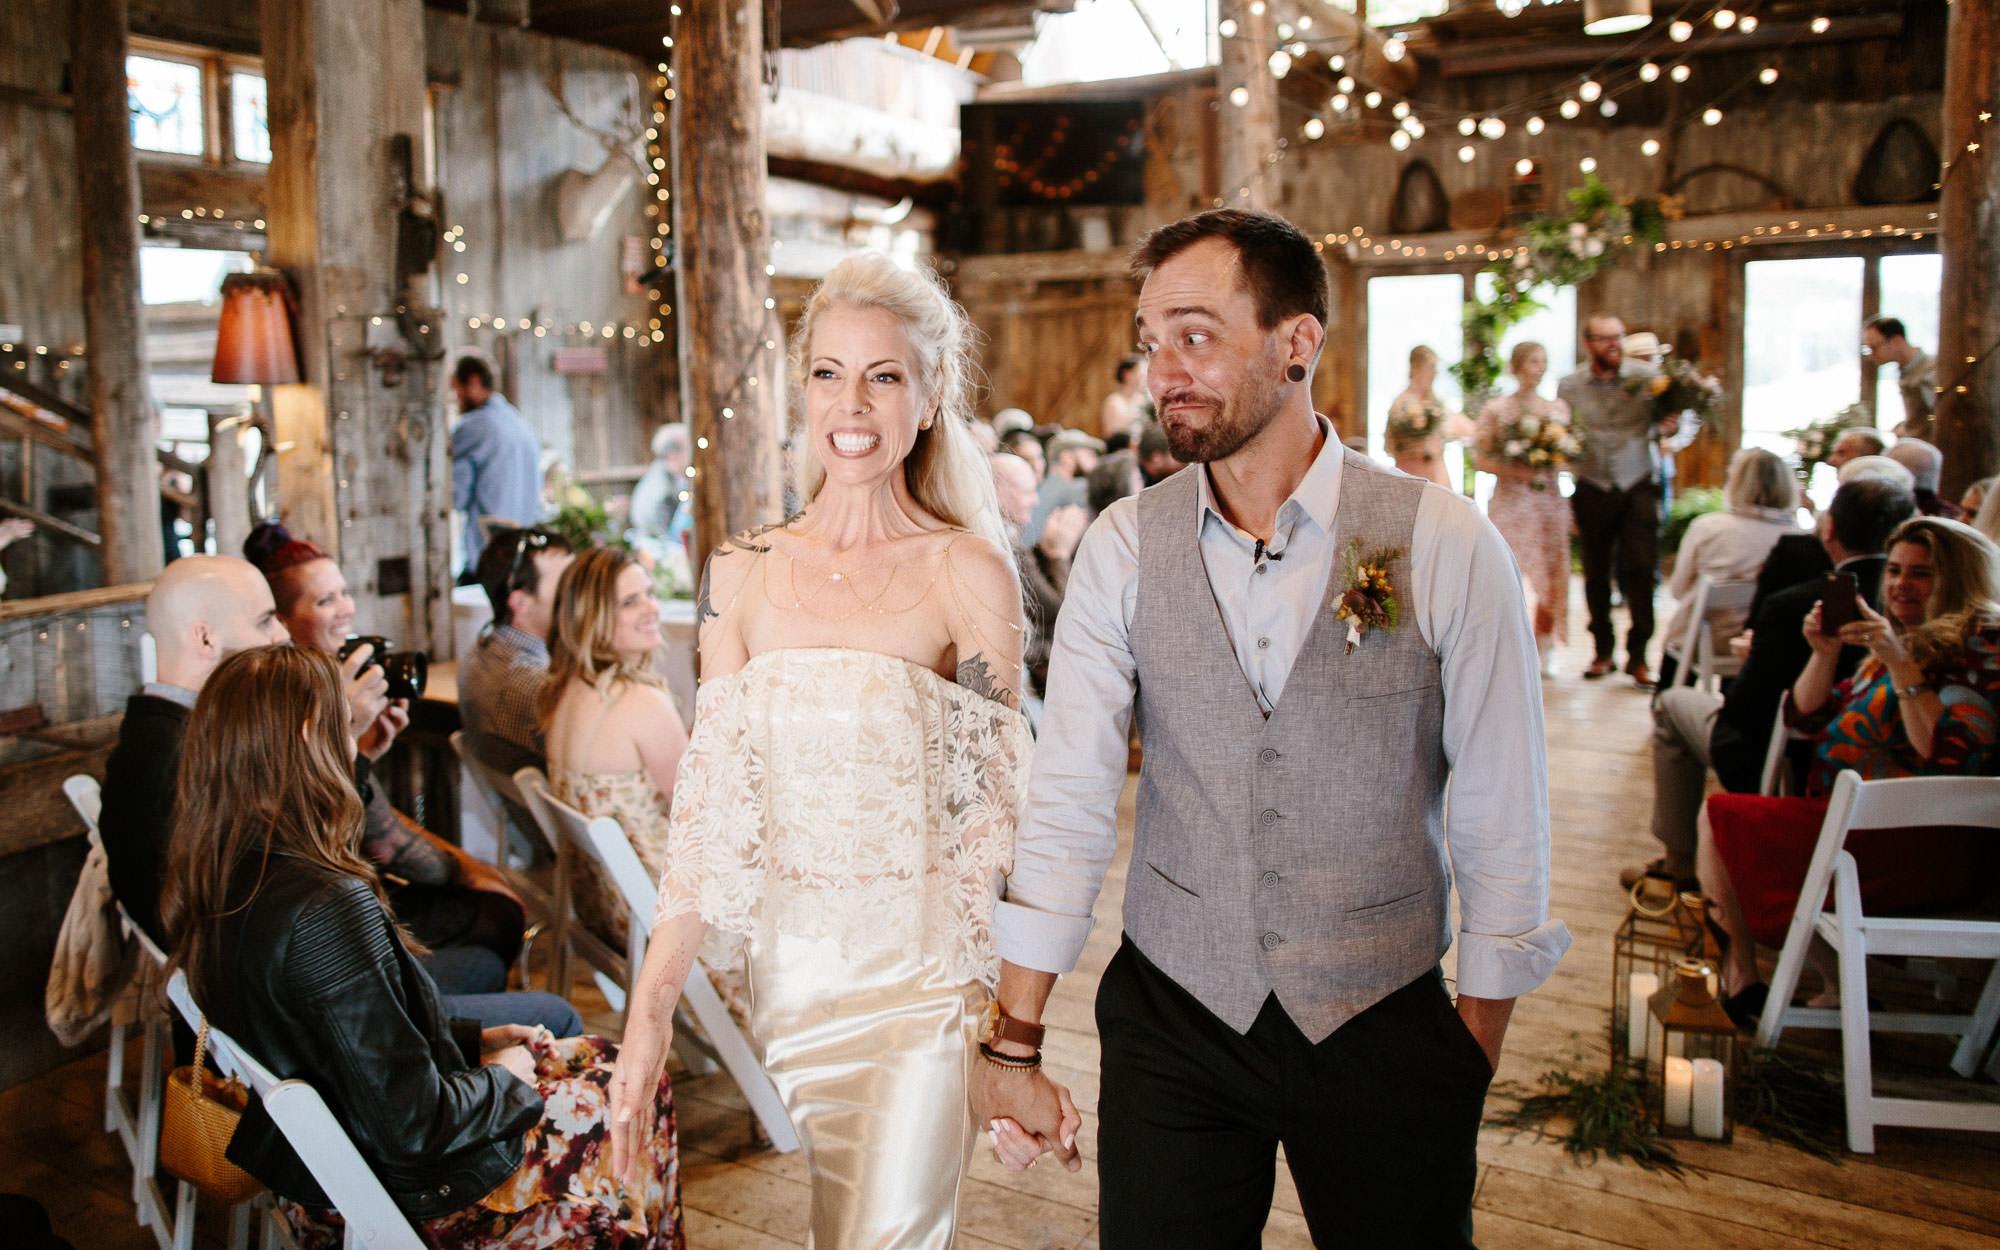 bucci-barn-wedding-elopement-evergreen-boulder-denver-colorado-adventerous-romantic-timeless-068.jpg